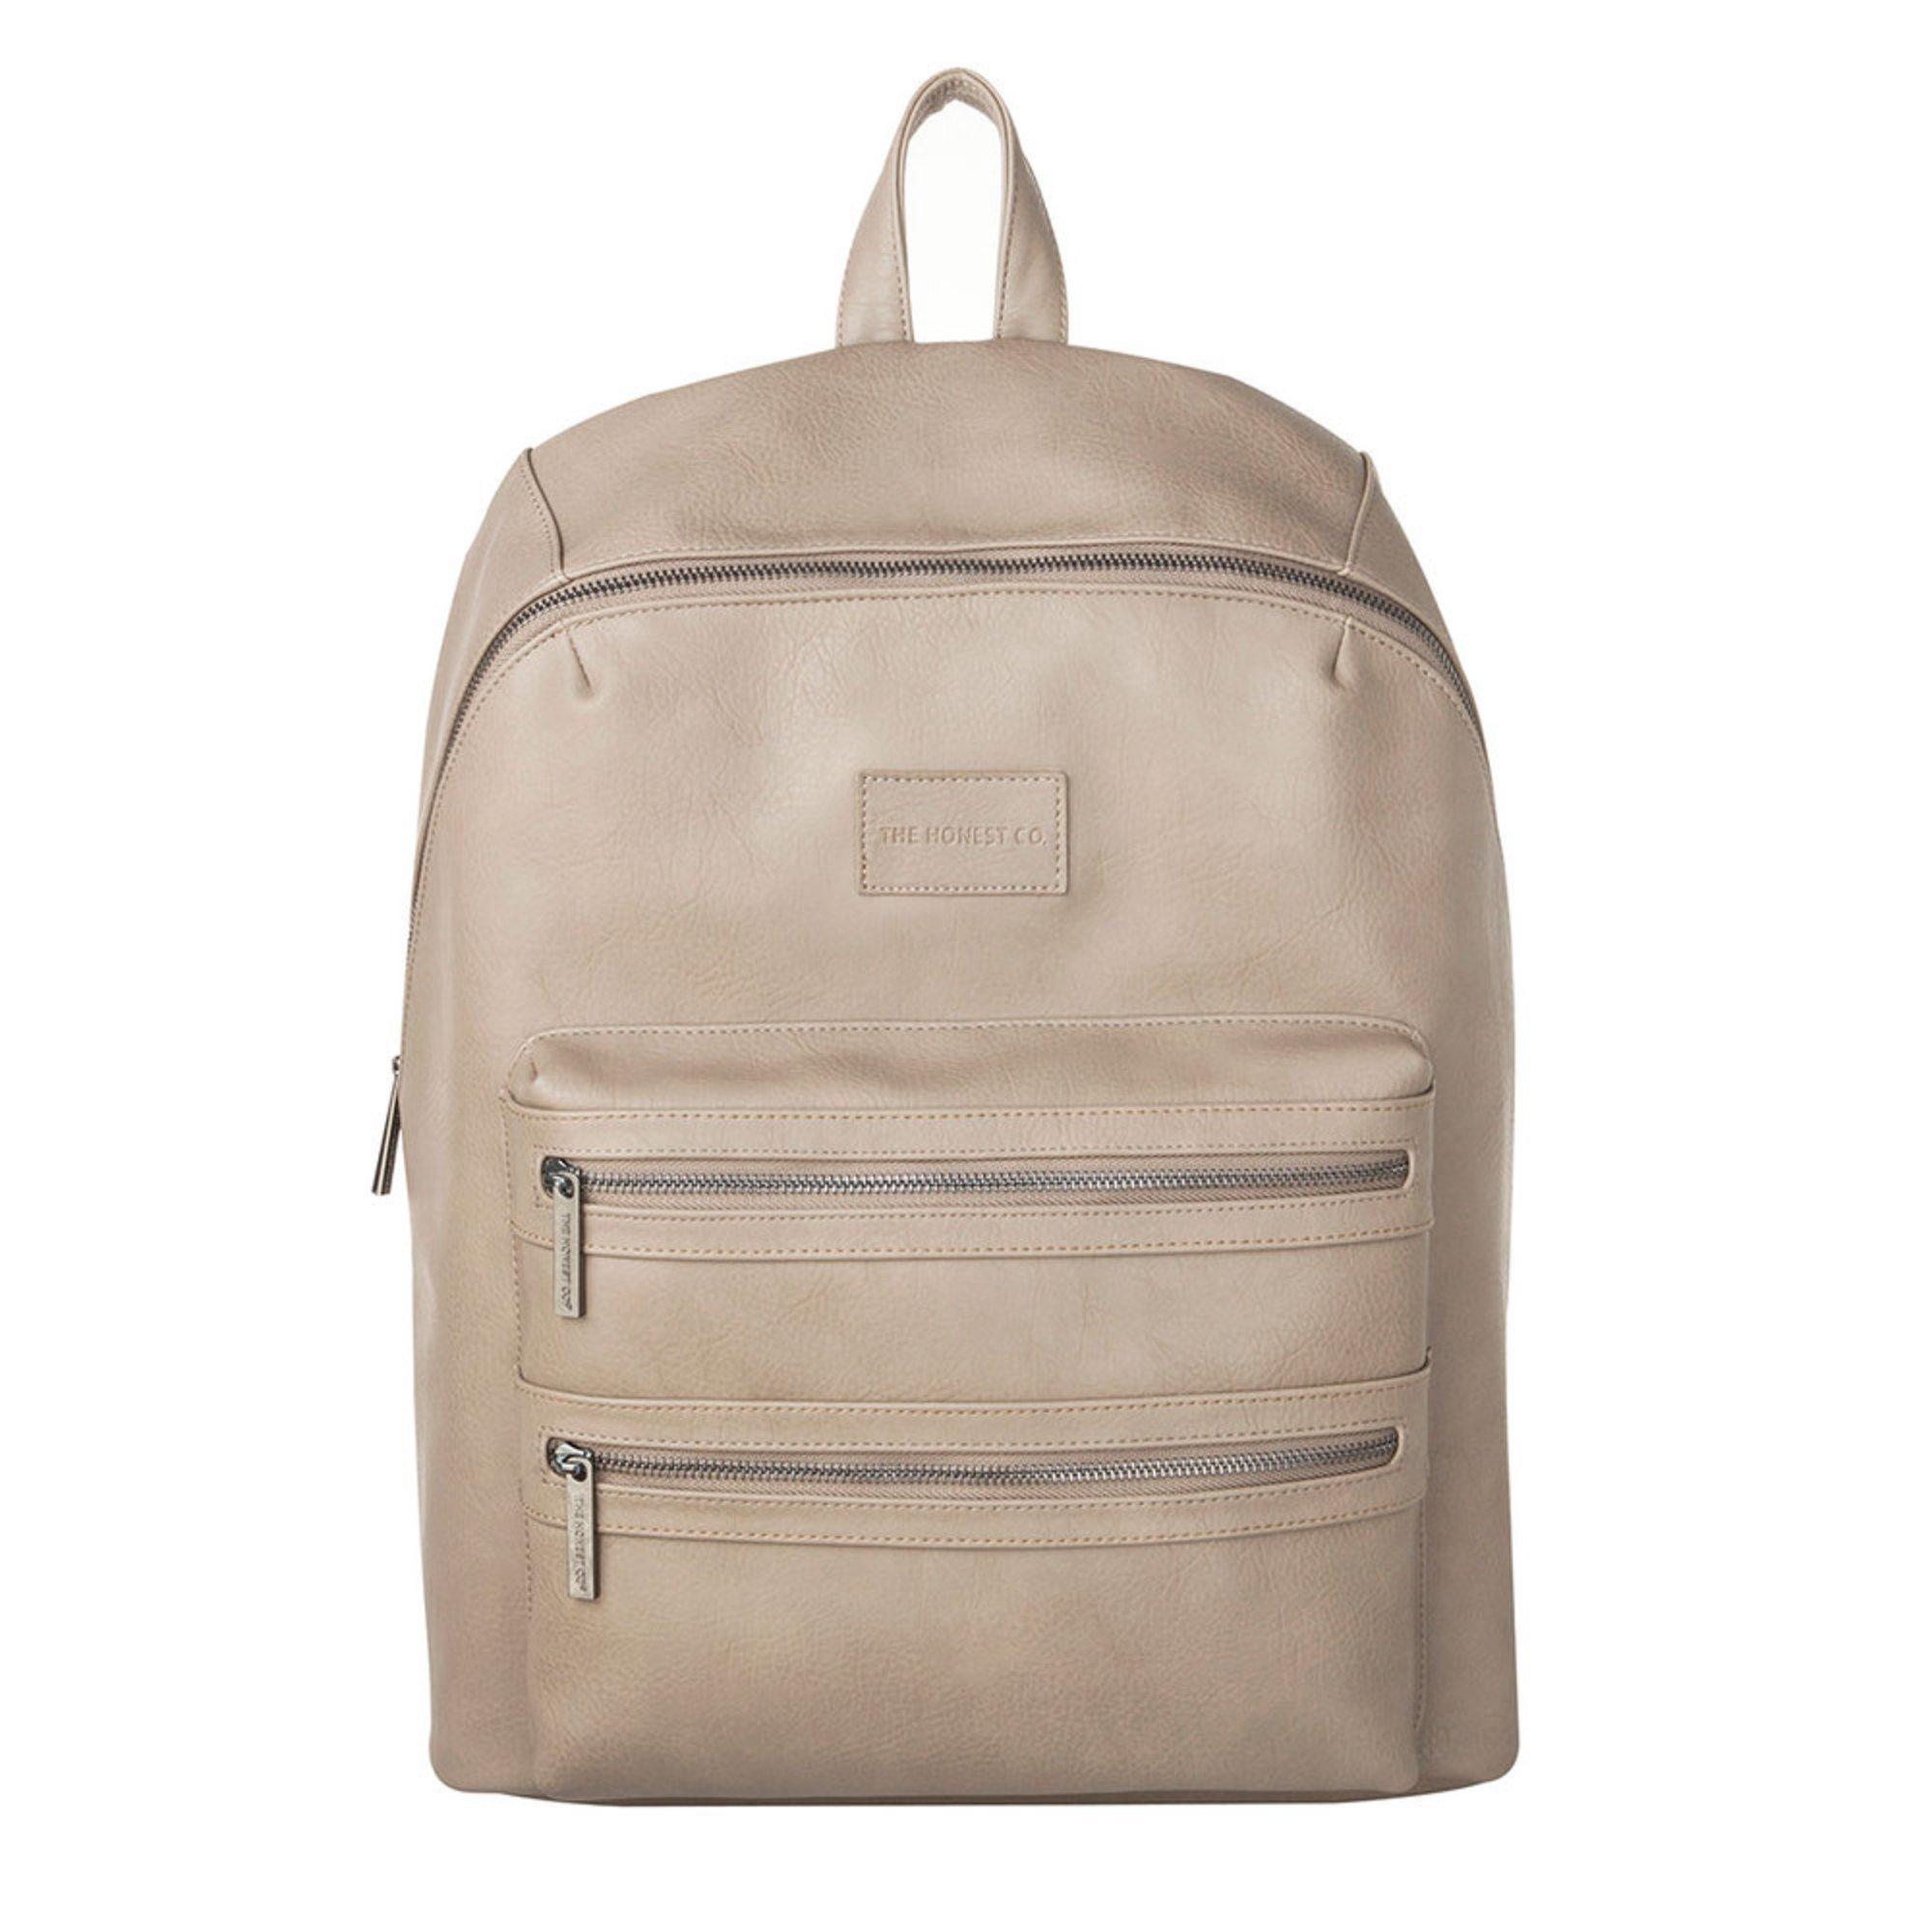 The Honest Company City Backpack Elephant Grey